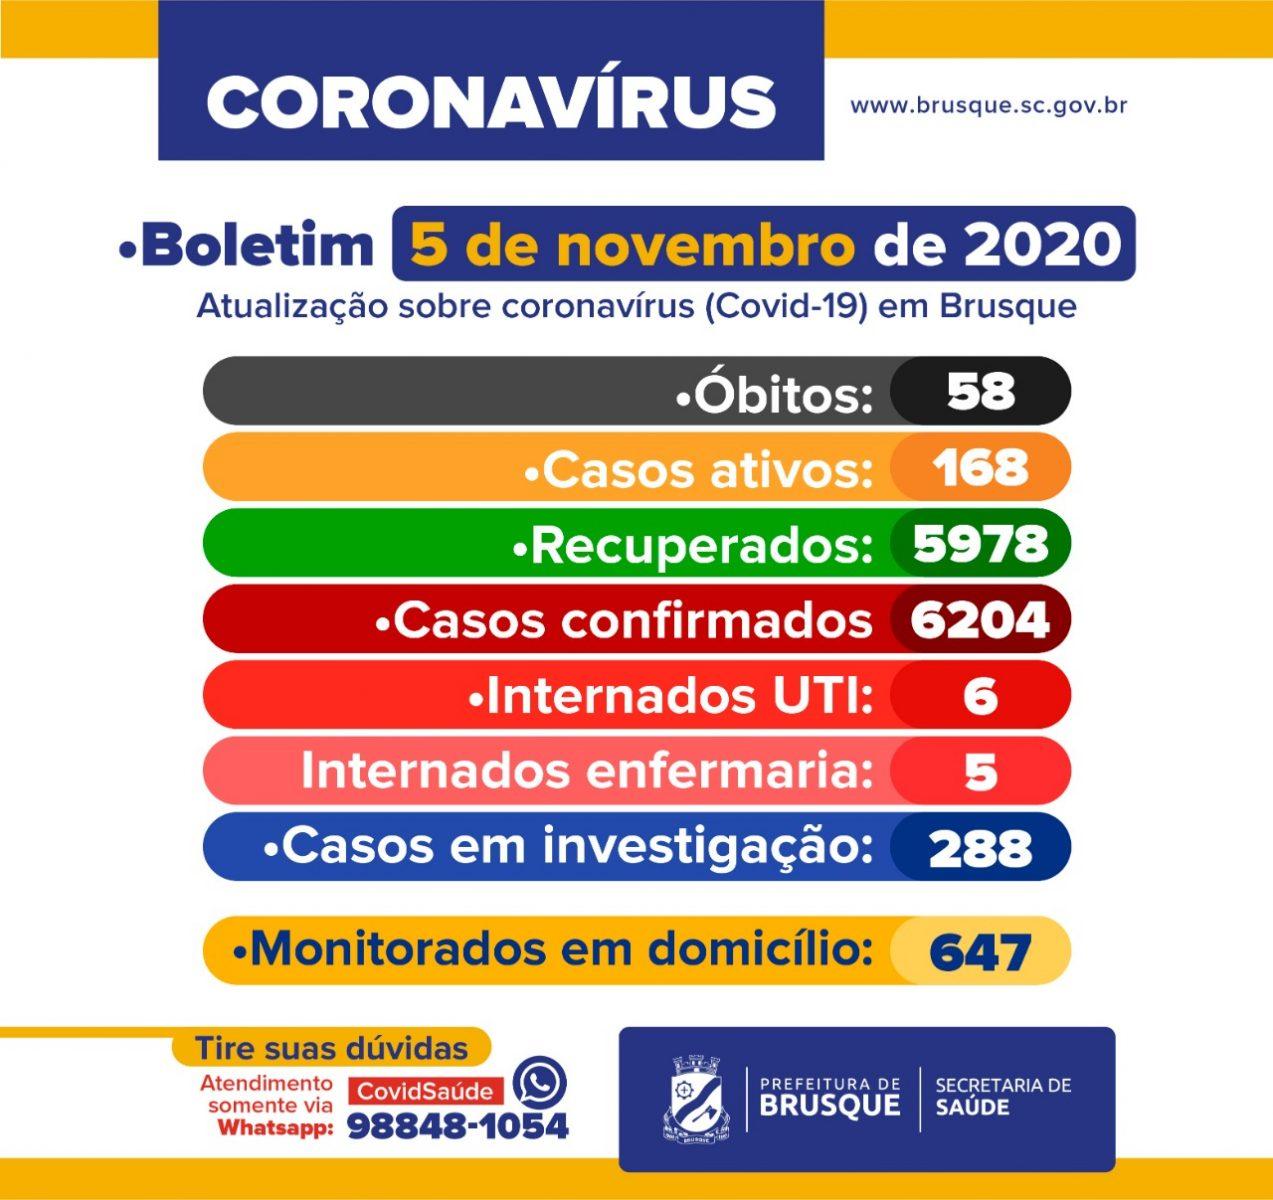 Covid-19: Confira o boletim epidemiológico desta quinta-feira (5)